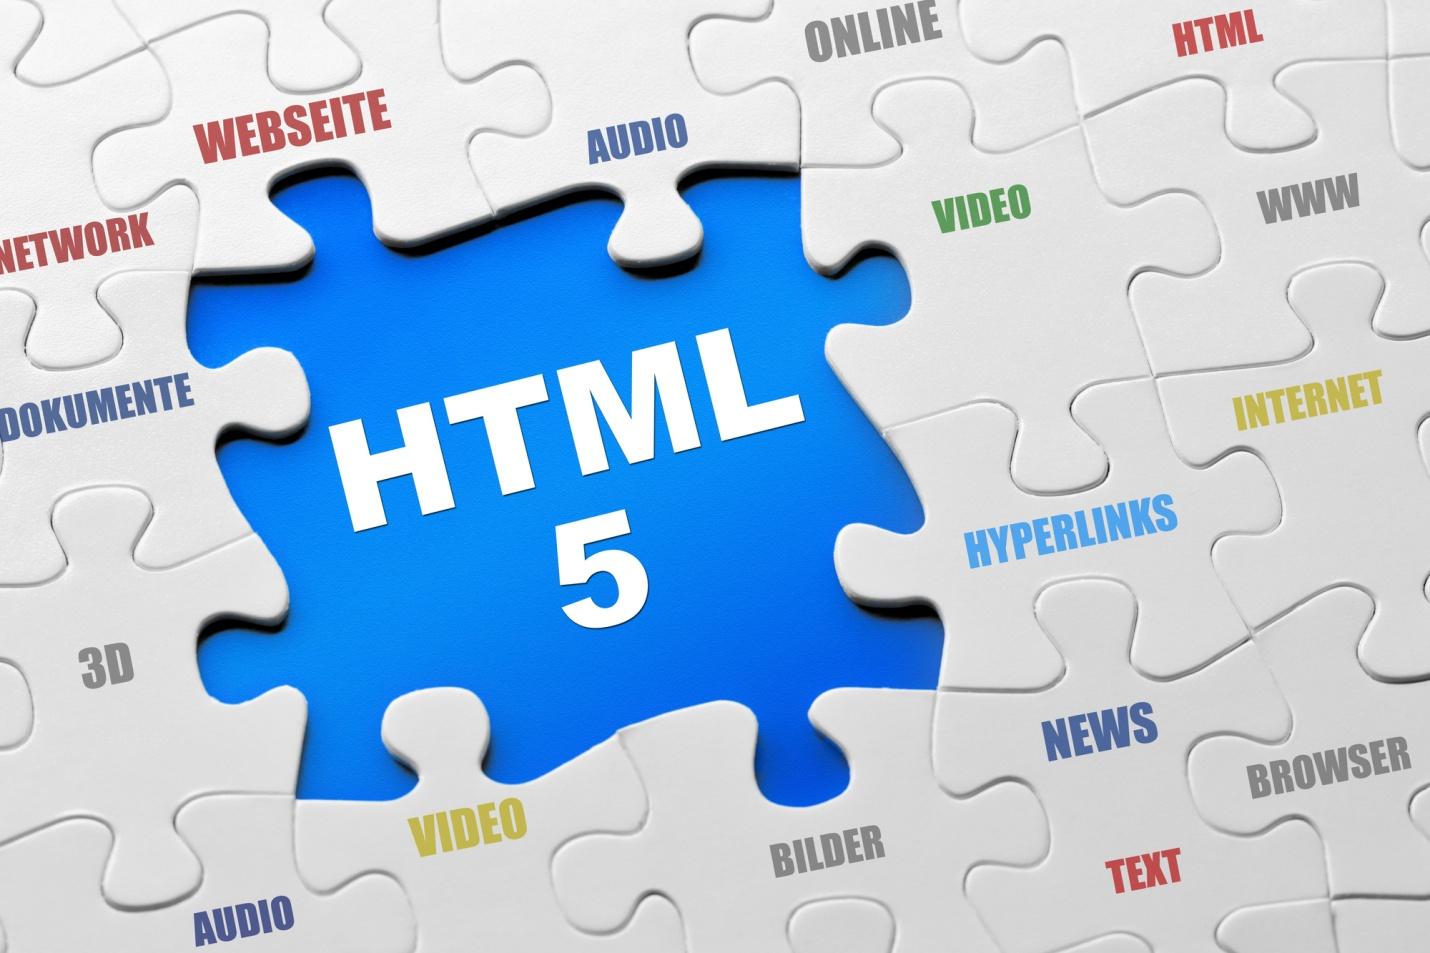 HTML5 آخرین نسخه منتشر شده و دارای خصوصیات جدید و کاربردی است | پرگاس